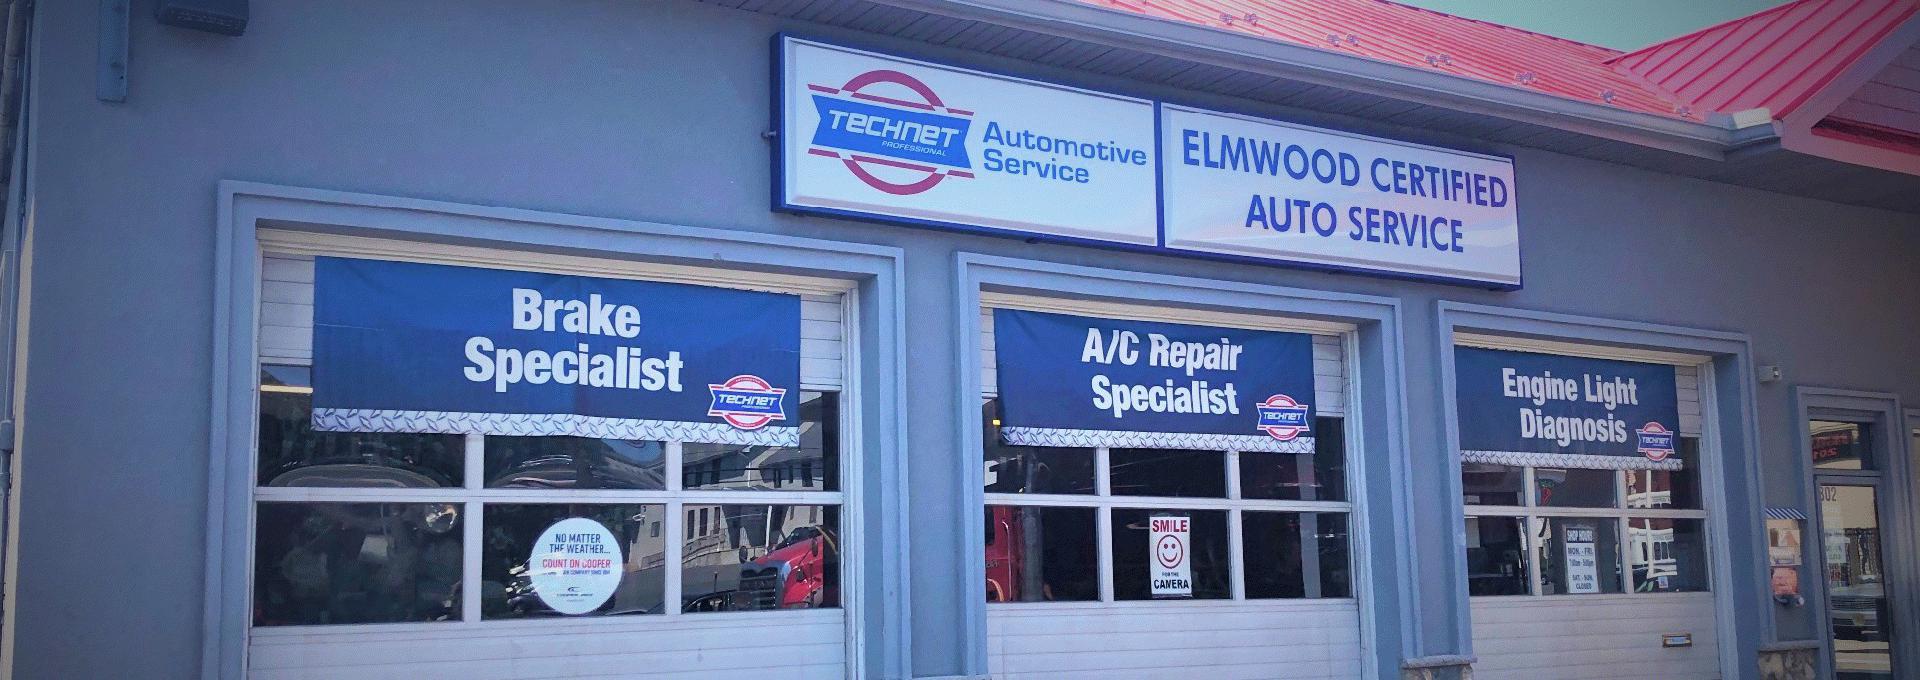 Auto Service Auto Repair In Elmwood Park Elmwood Certified Auto Service